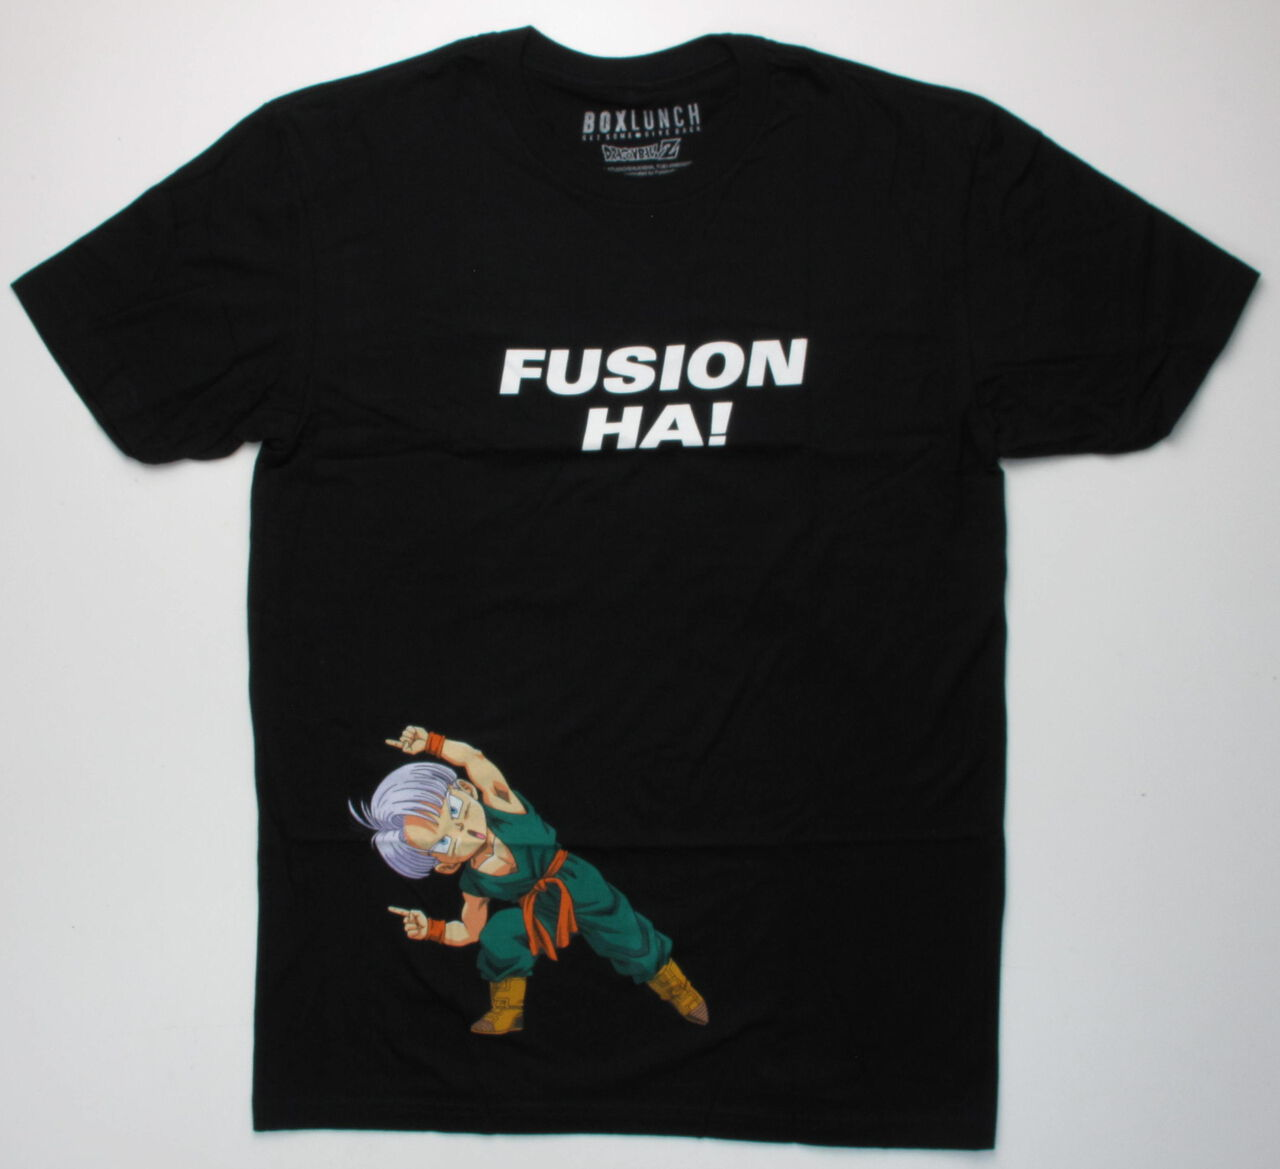 Dragon Ball Z Fusion Ha Trunks T-Shirt